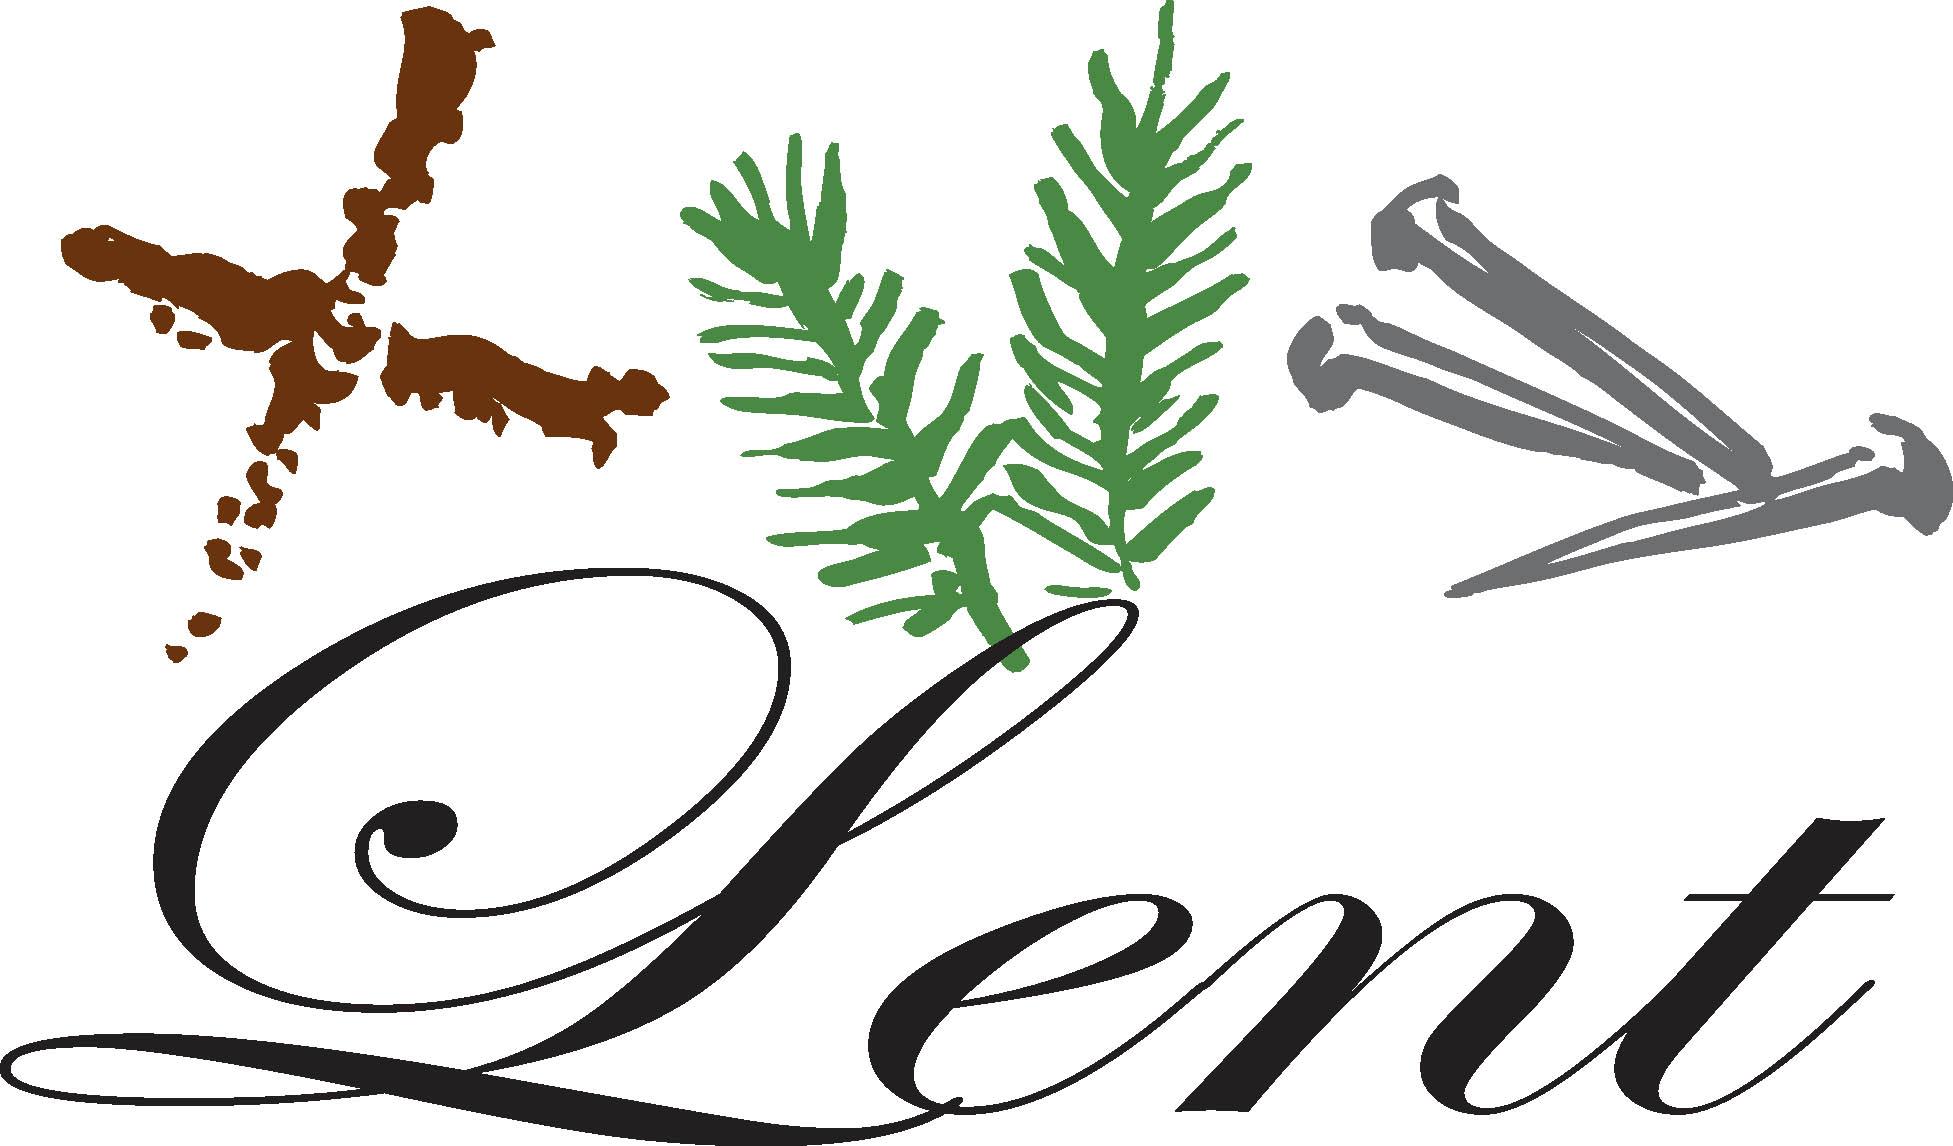 Lenten Clipart Free-Lenten Clipart Free-3